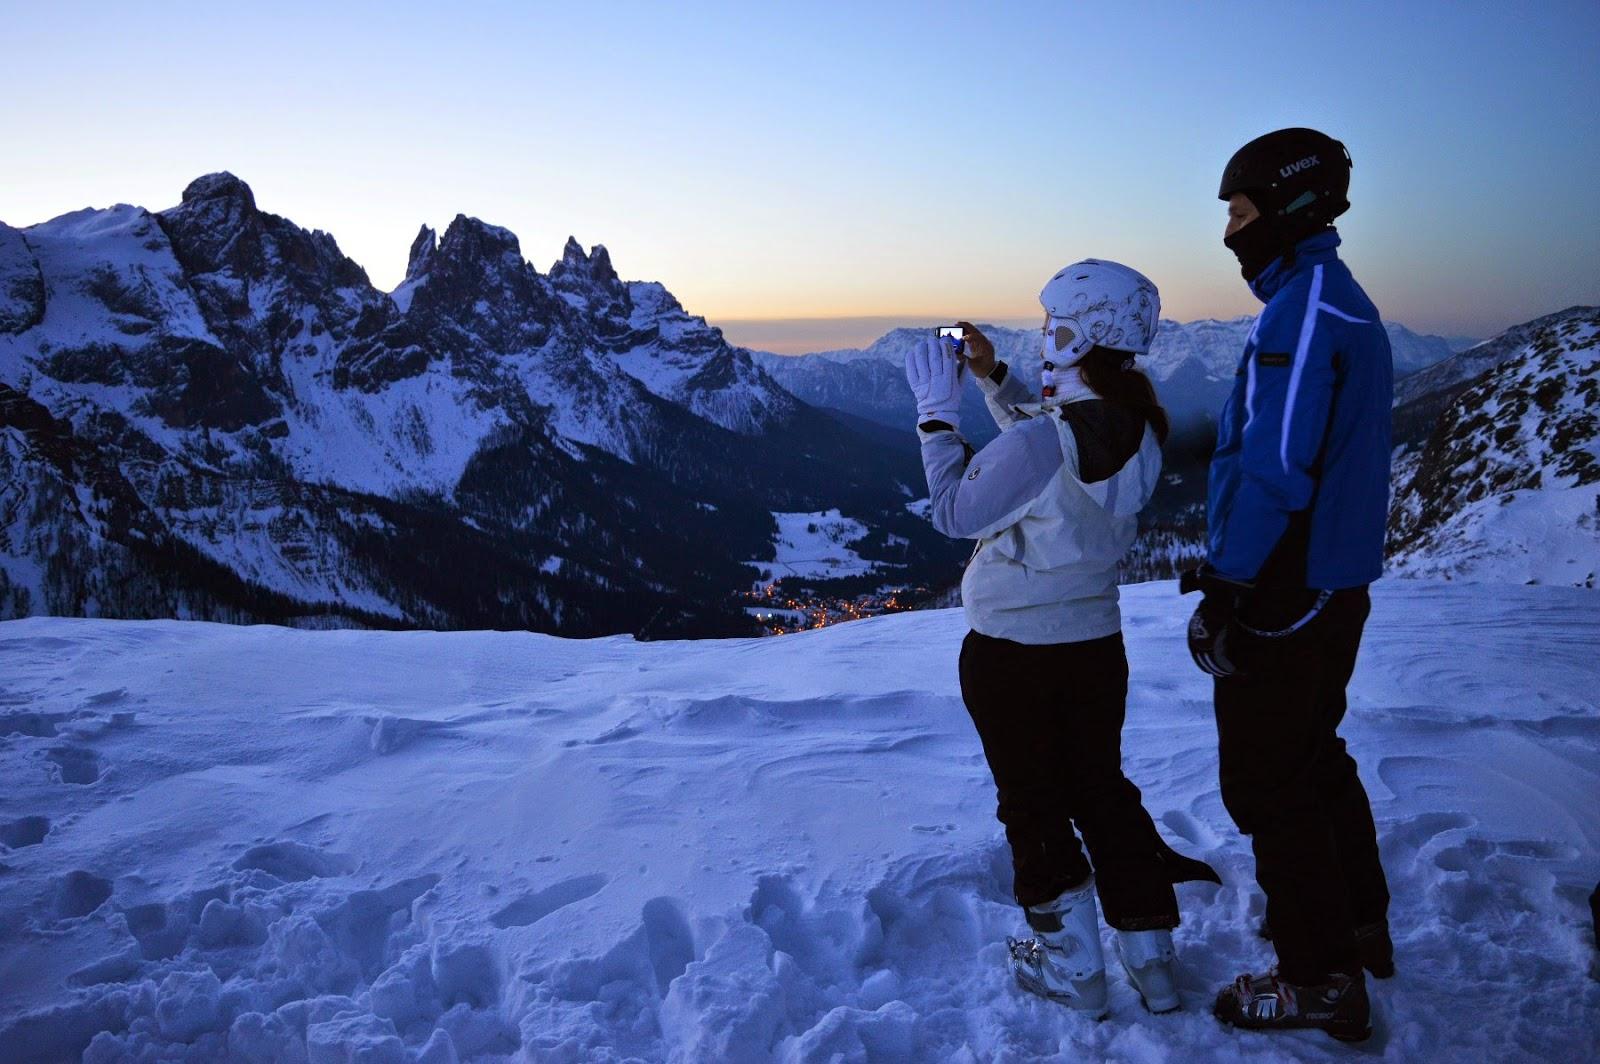 Trentino Ski Sunrise alba sulle dolomiti